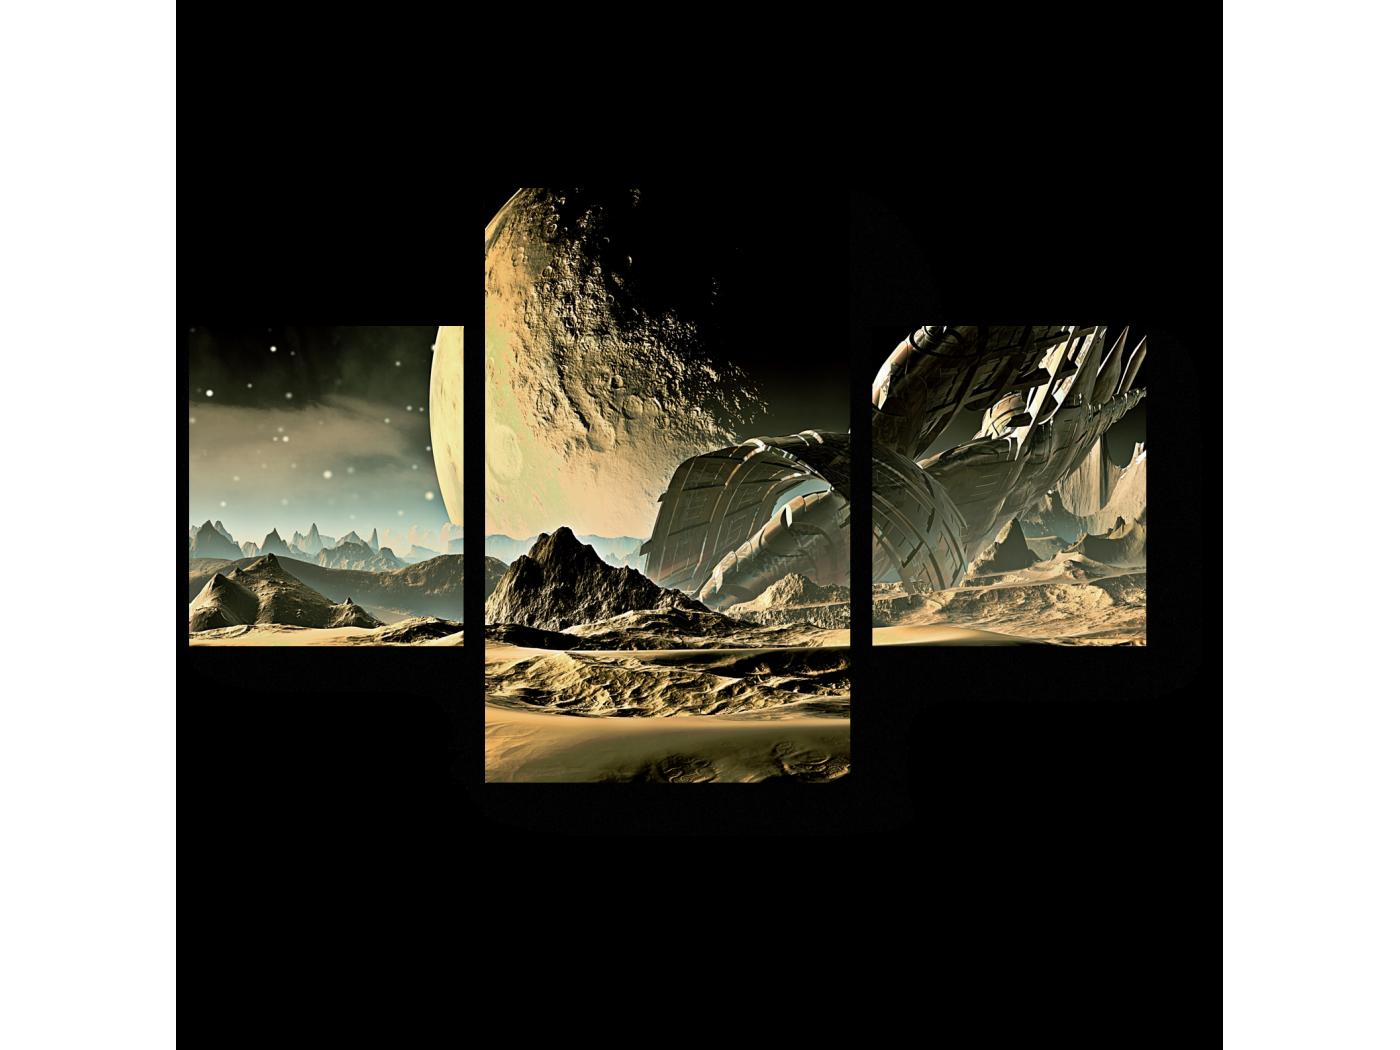 Модульная картина Могучий космос (80x52) фото